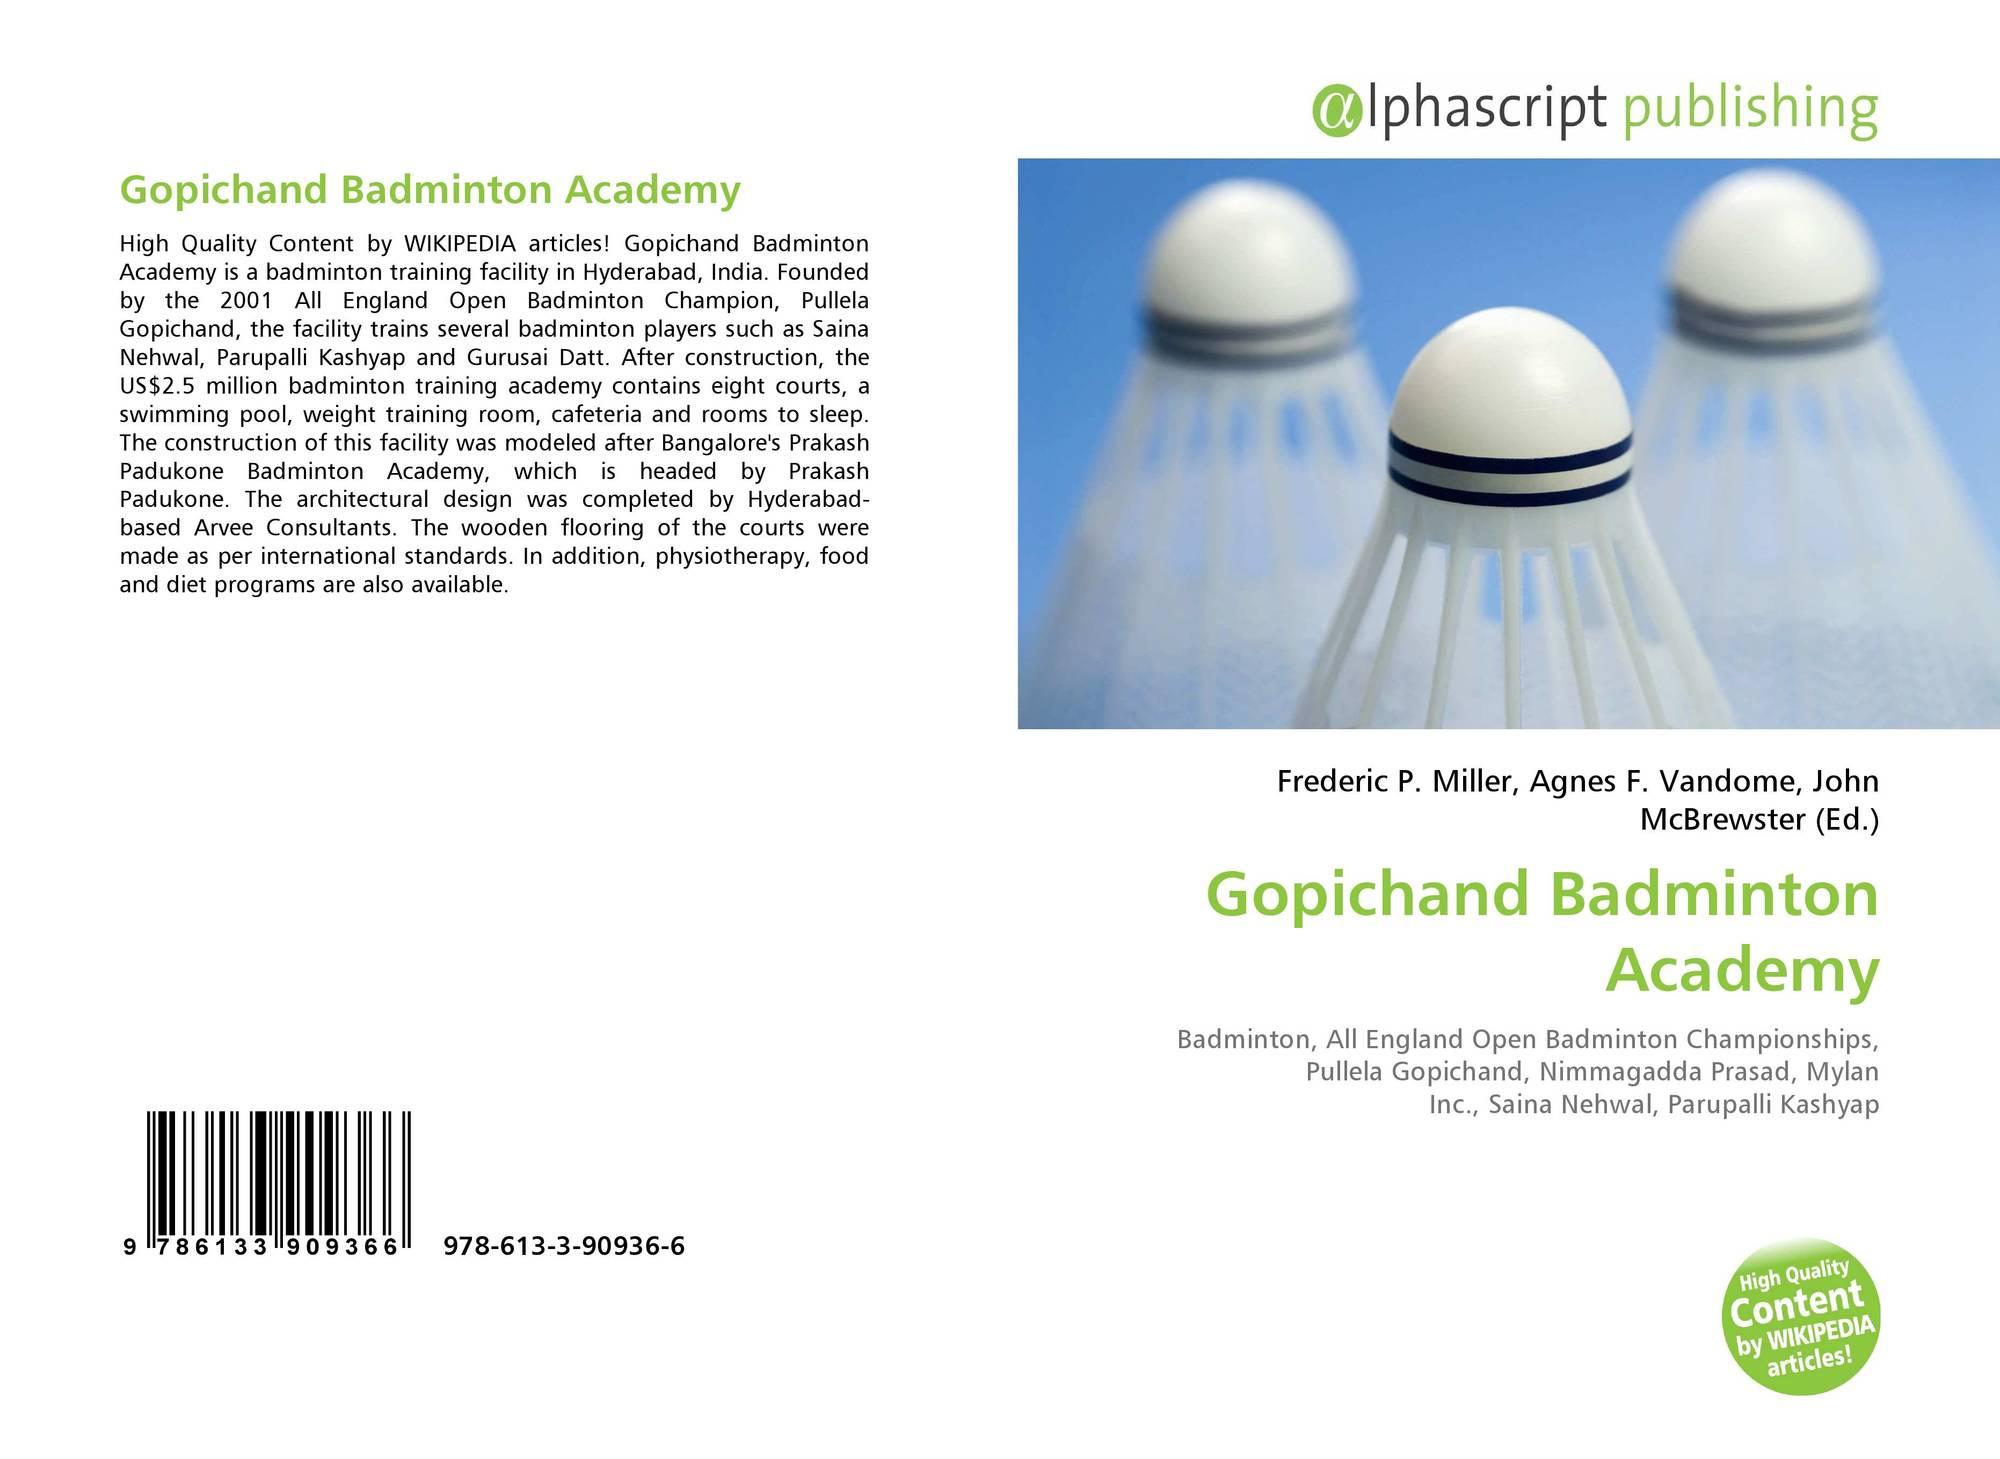 Gopichand Badminton Academy 978 613 3 90936 6 6133909366 9786133909366